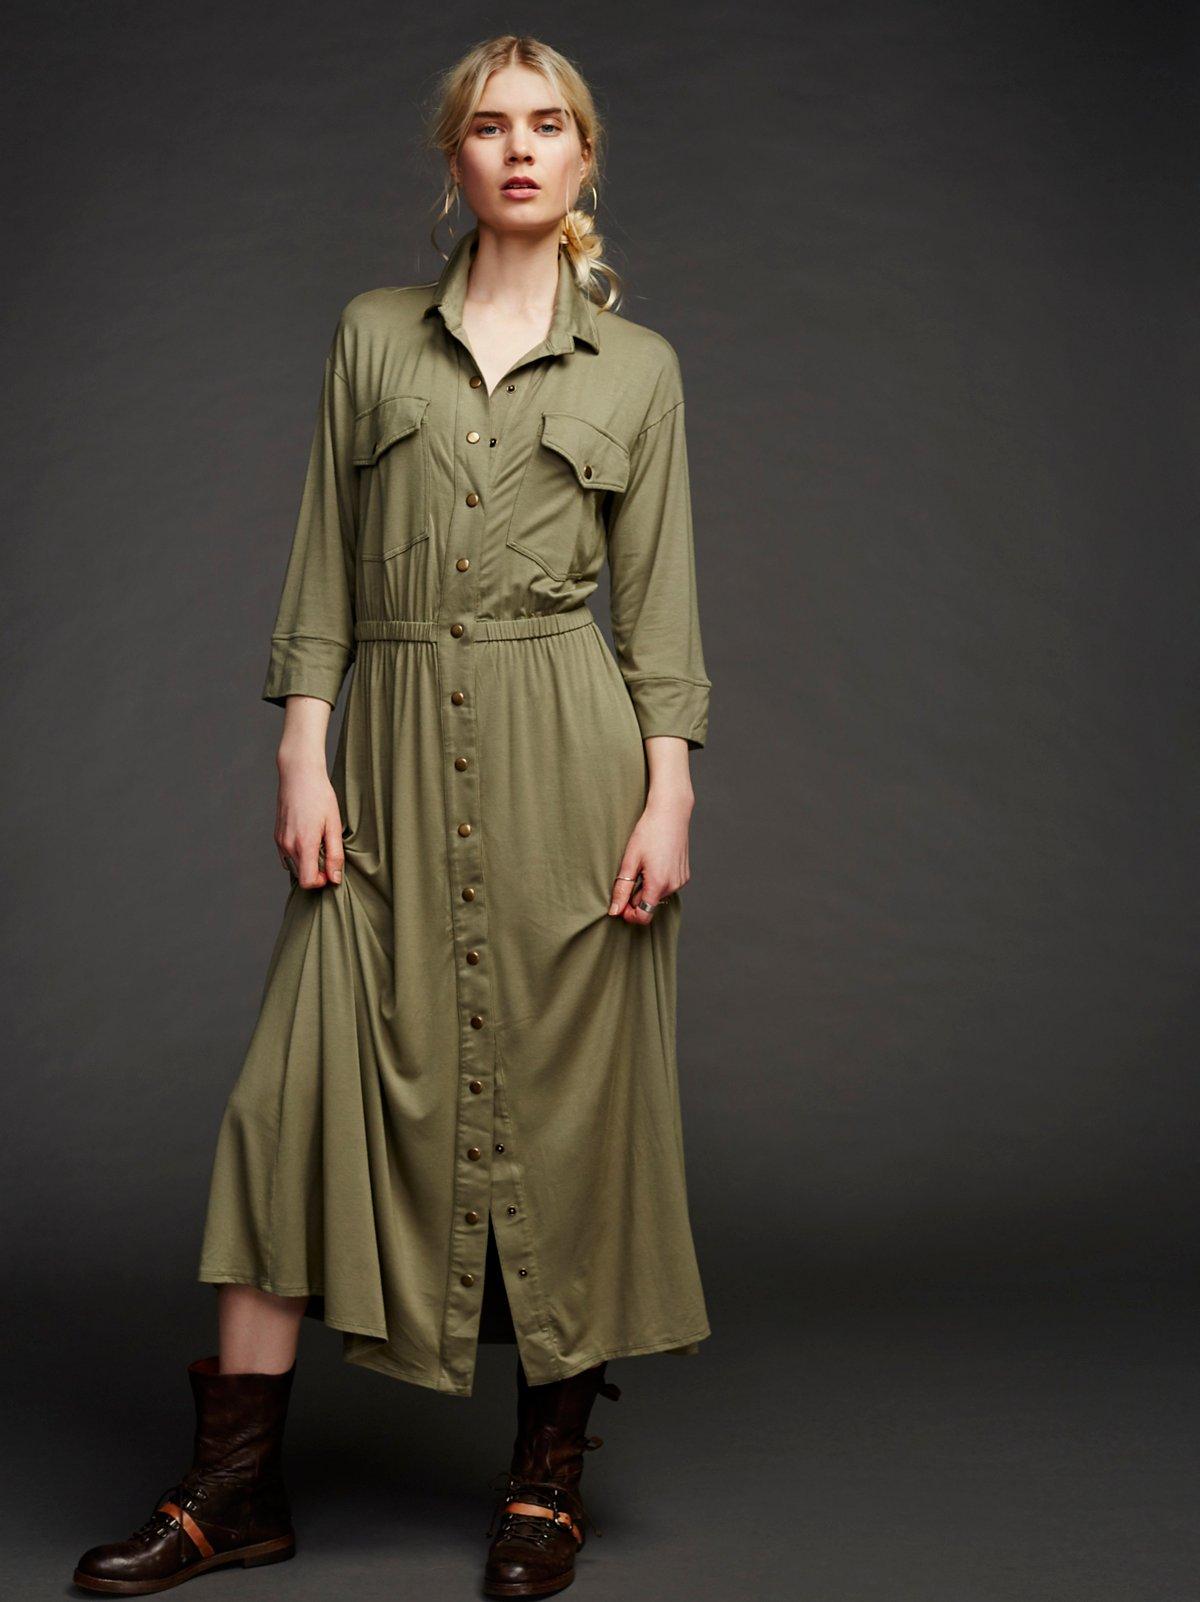 Mirette连衣裙